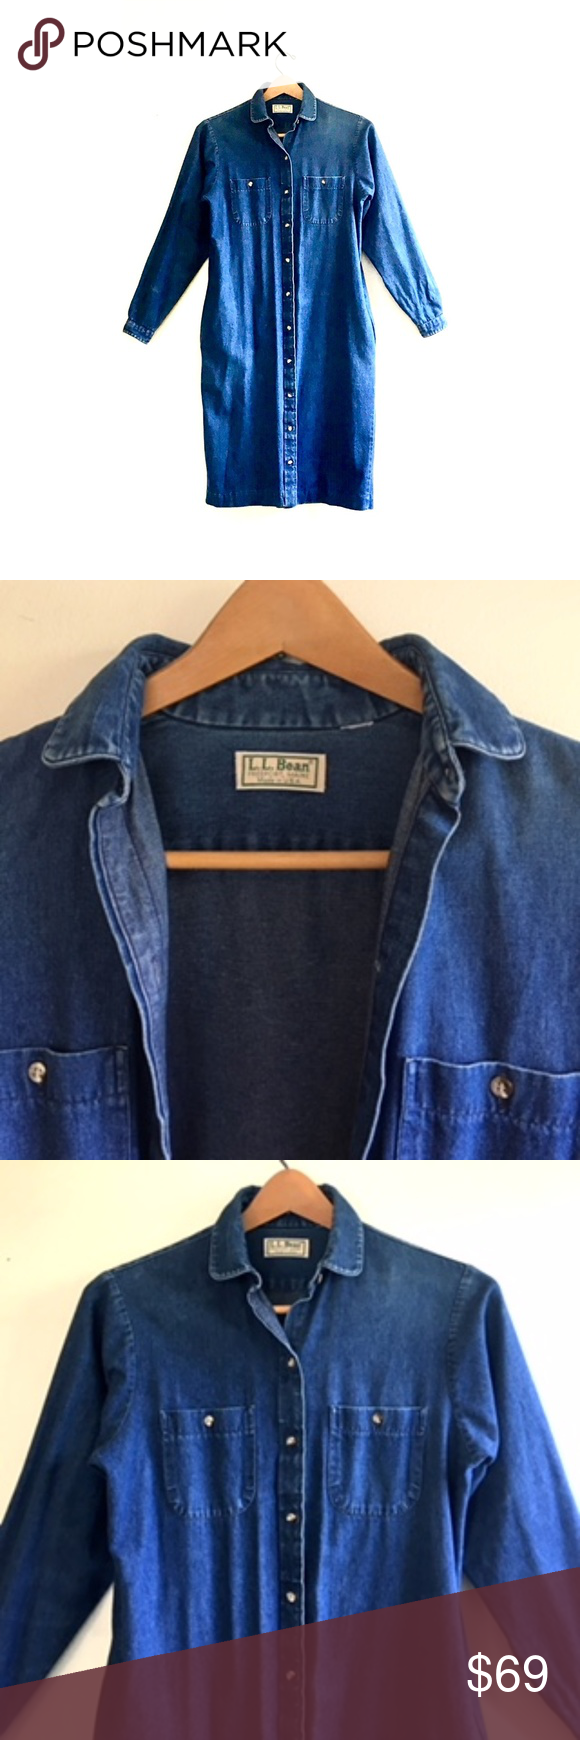 Vintage Womens Mid Blue Denim Jacket Long Sleeve Casual Regular Fit Jean Style